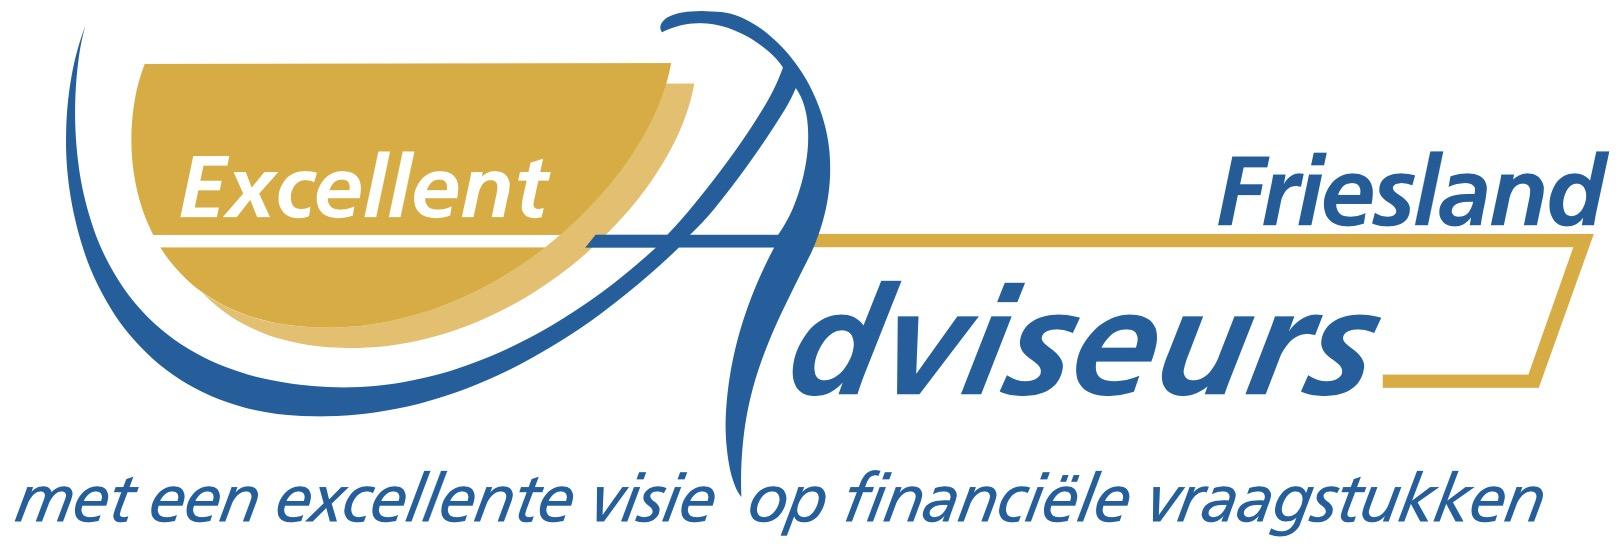 Excellent Groep Friesland